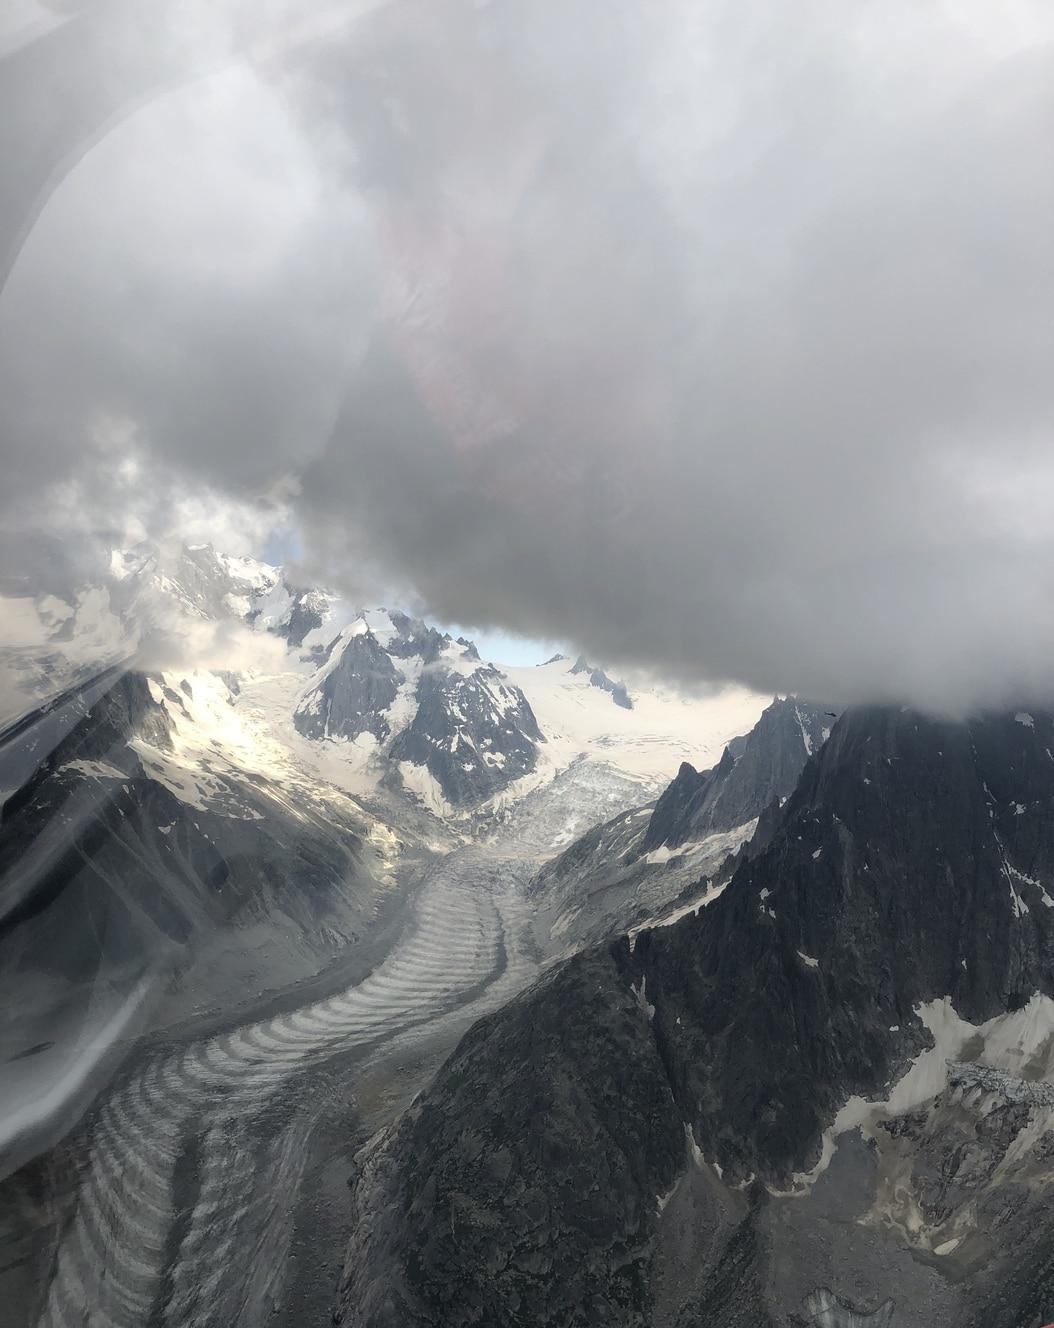 aerocime - vol avion massif du mont blanc - megeve - France - image 5